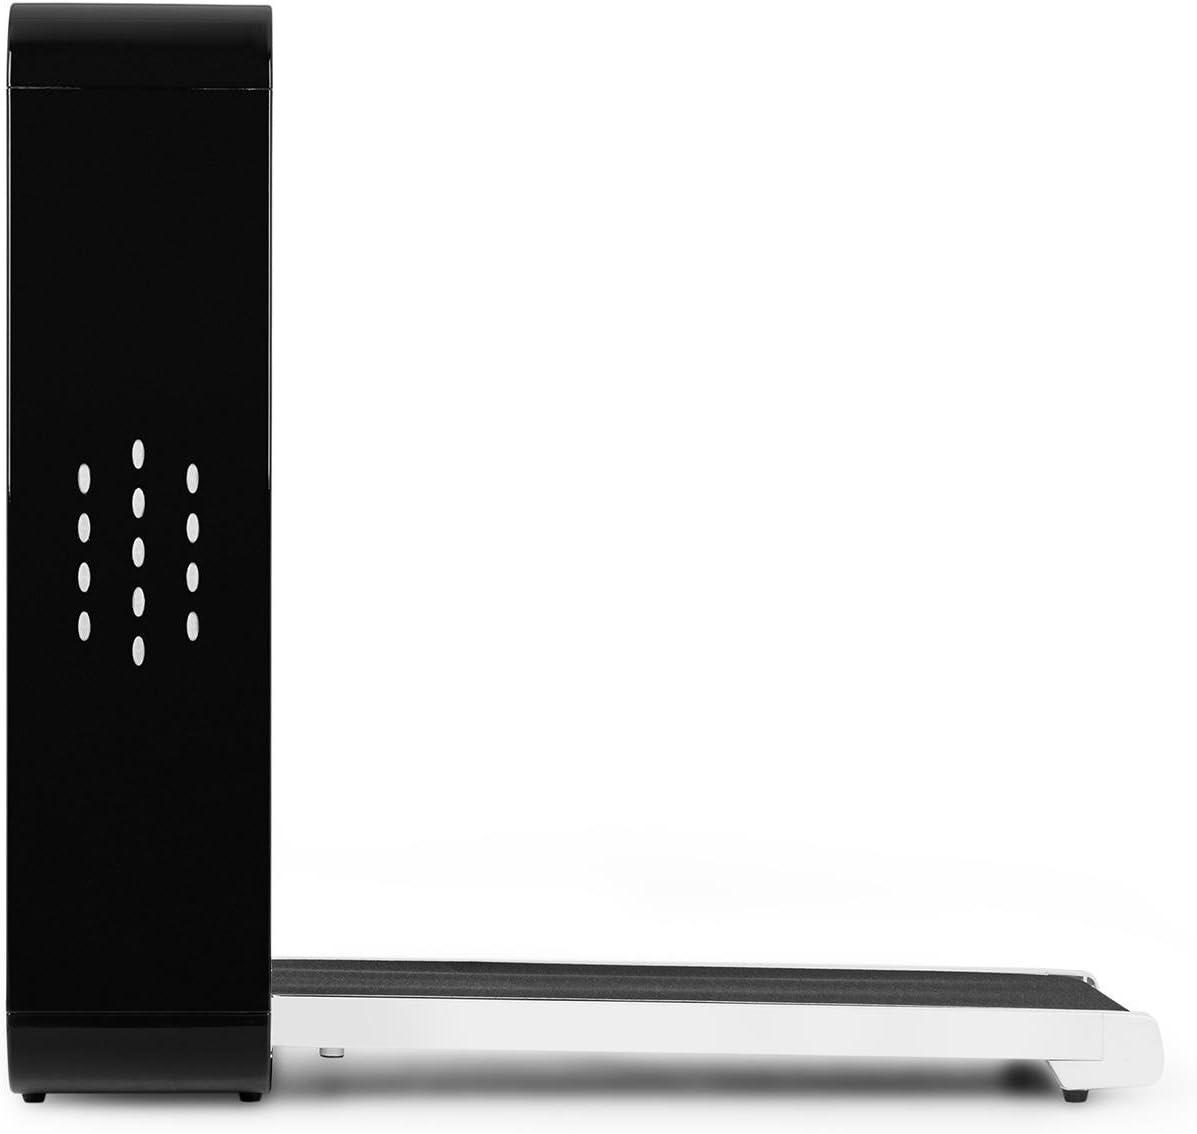 Streaming Wireless Home Trainer velocit/à Regolabile 0,8-10 km//h 1000W Bluetooth Arresto di Emergenza Archiviazione Facile Tapis roulant LED Pieghevole Klarfit Home Runtasy